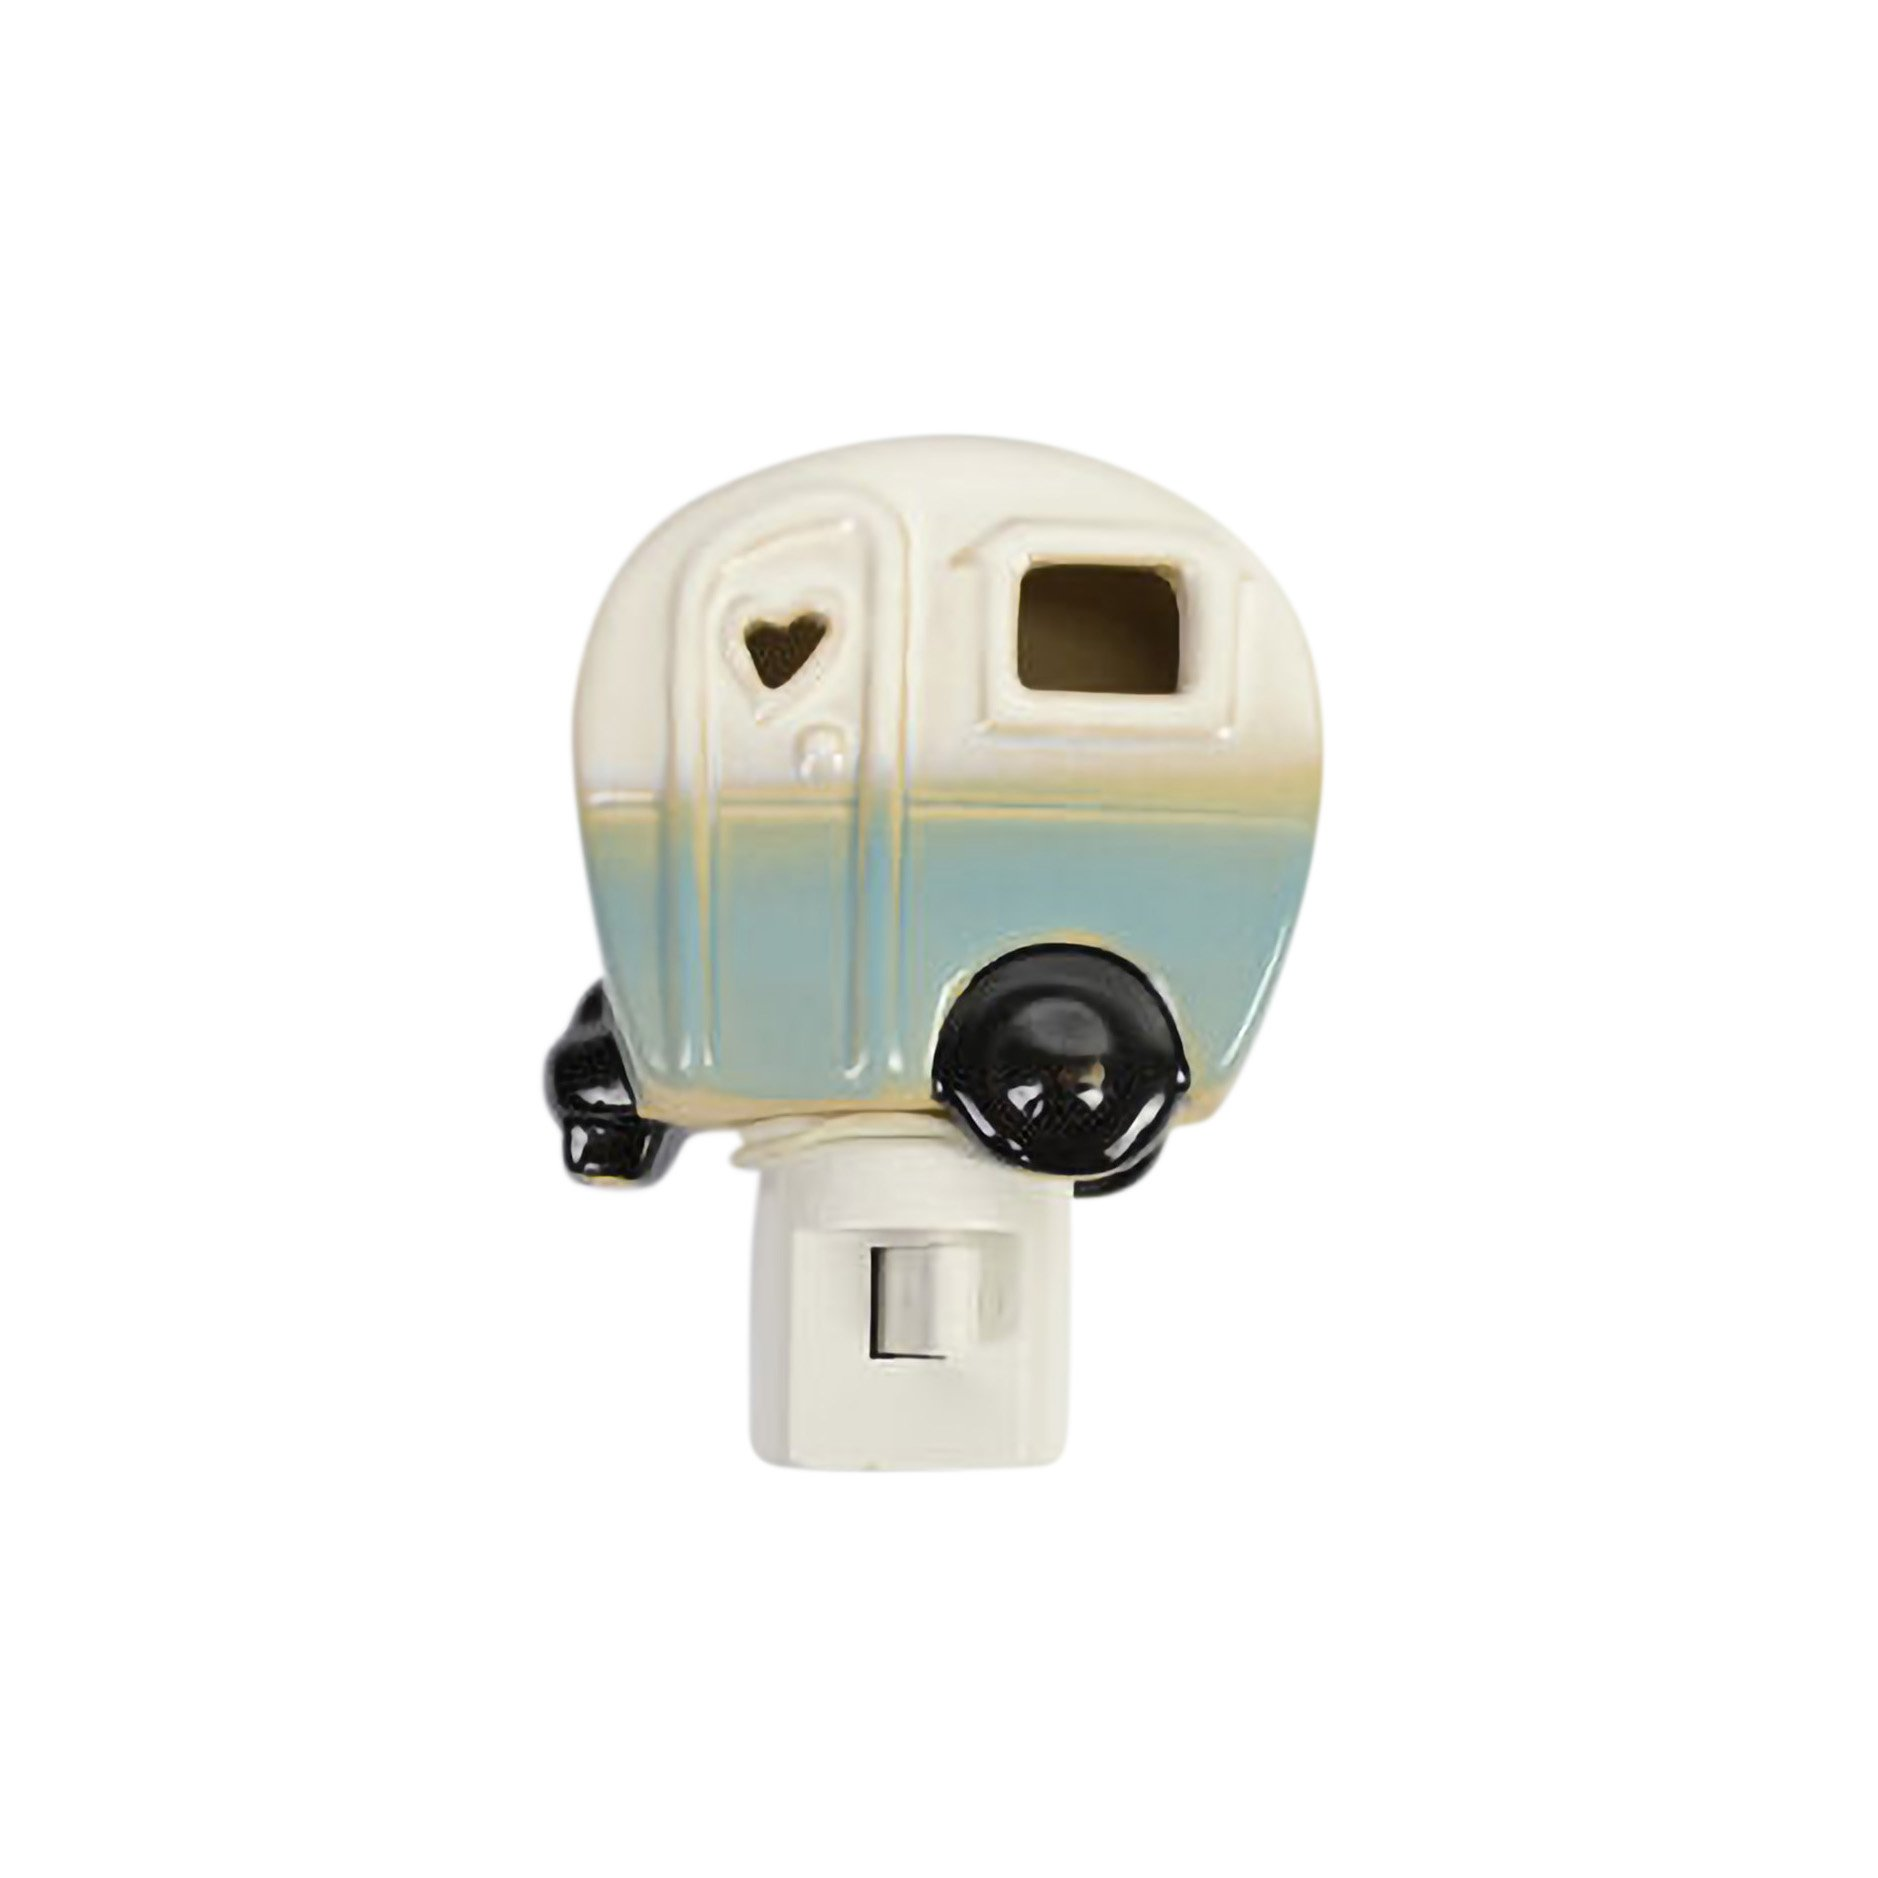 Drew Derose Glossy Blue Whimsical Camper RV Heart 7 x 4 Ceramic Night Light